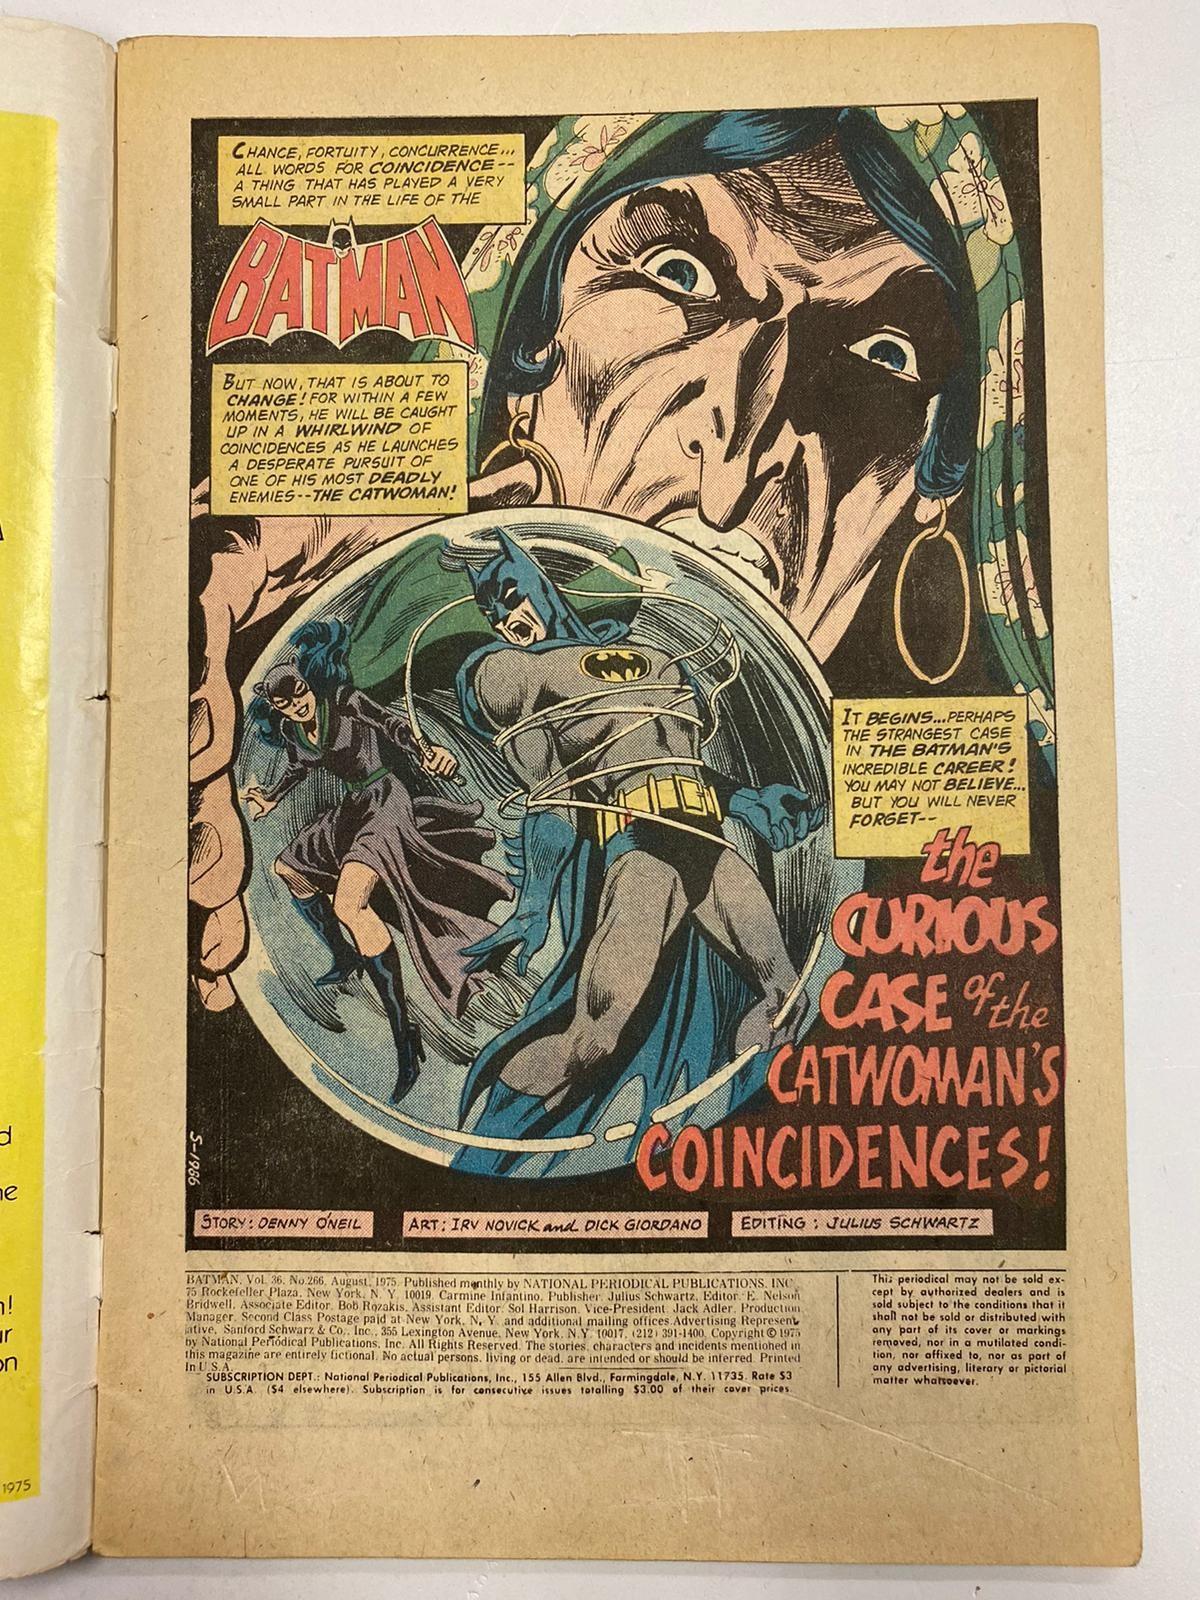 Vintage DC Comics - Batman (N0.266) in good condition. - Image 2 of 2